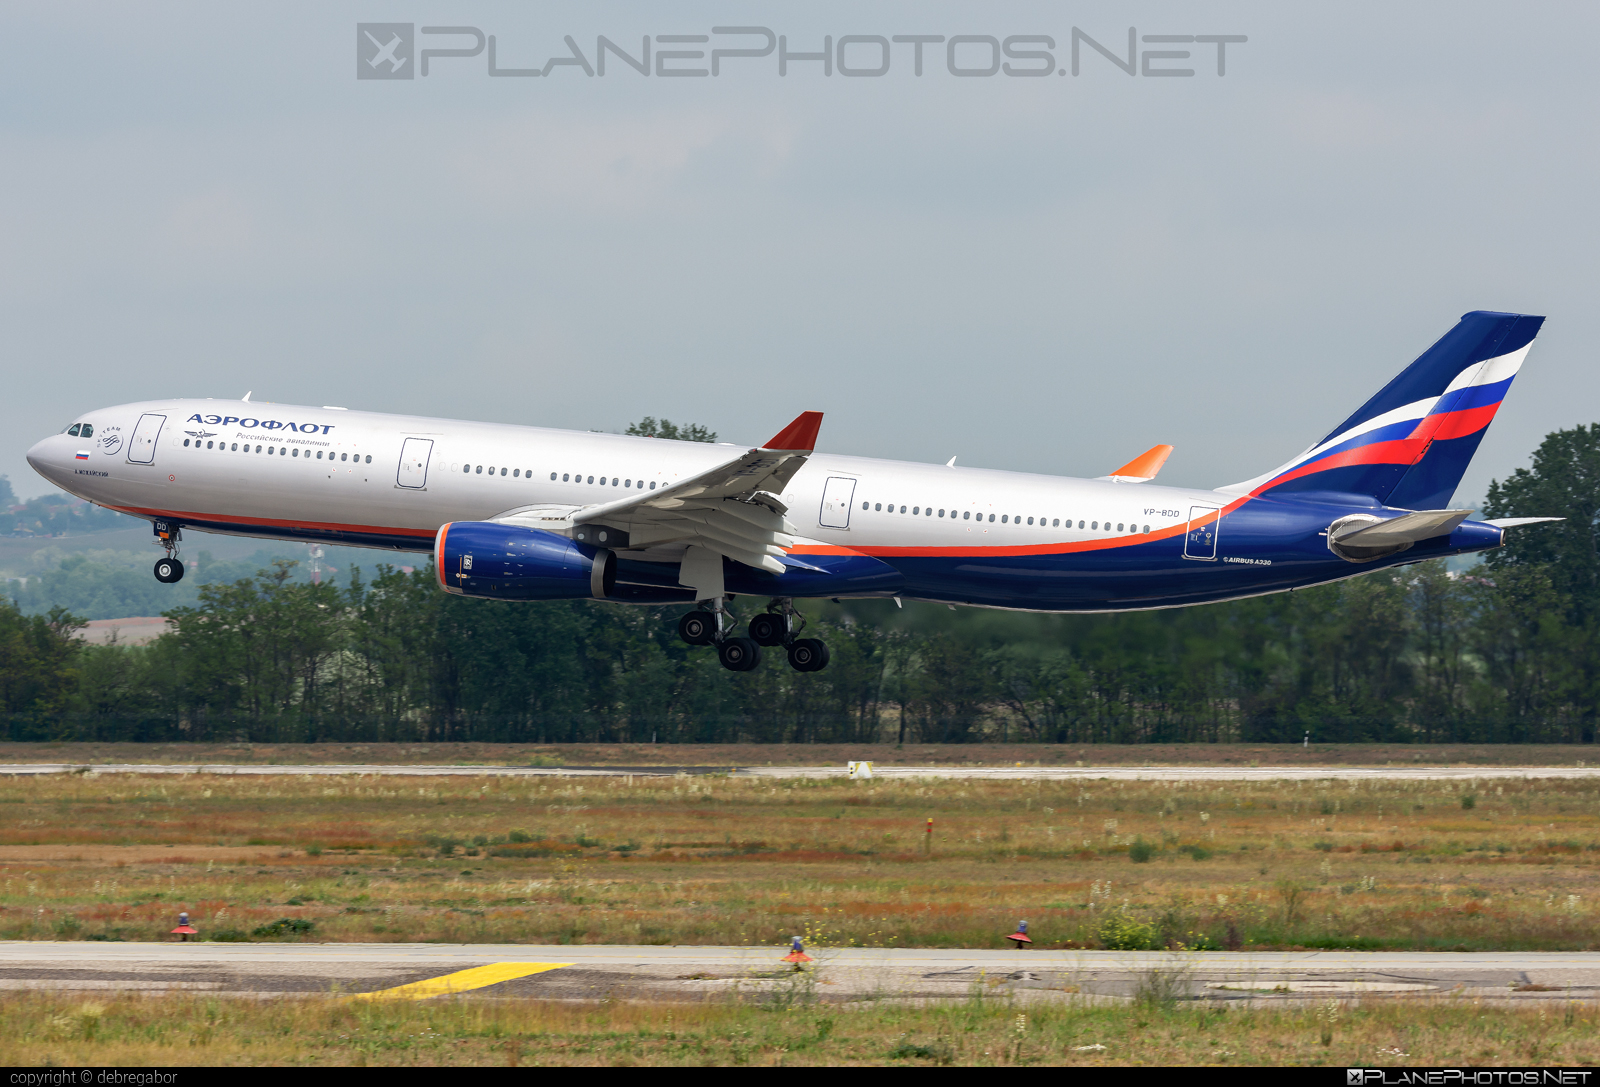 Airbus A330-343 - VP-BDD operated by Aeroflot #a330 #a330family #aeroflot #airbus #airbus330